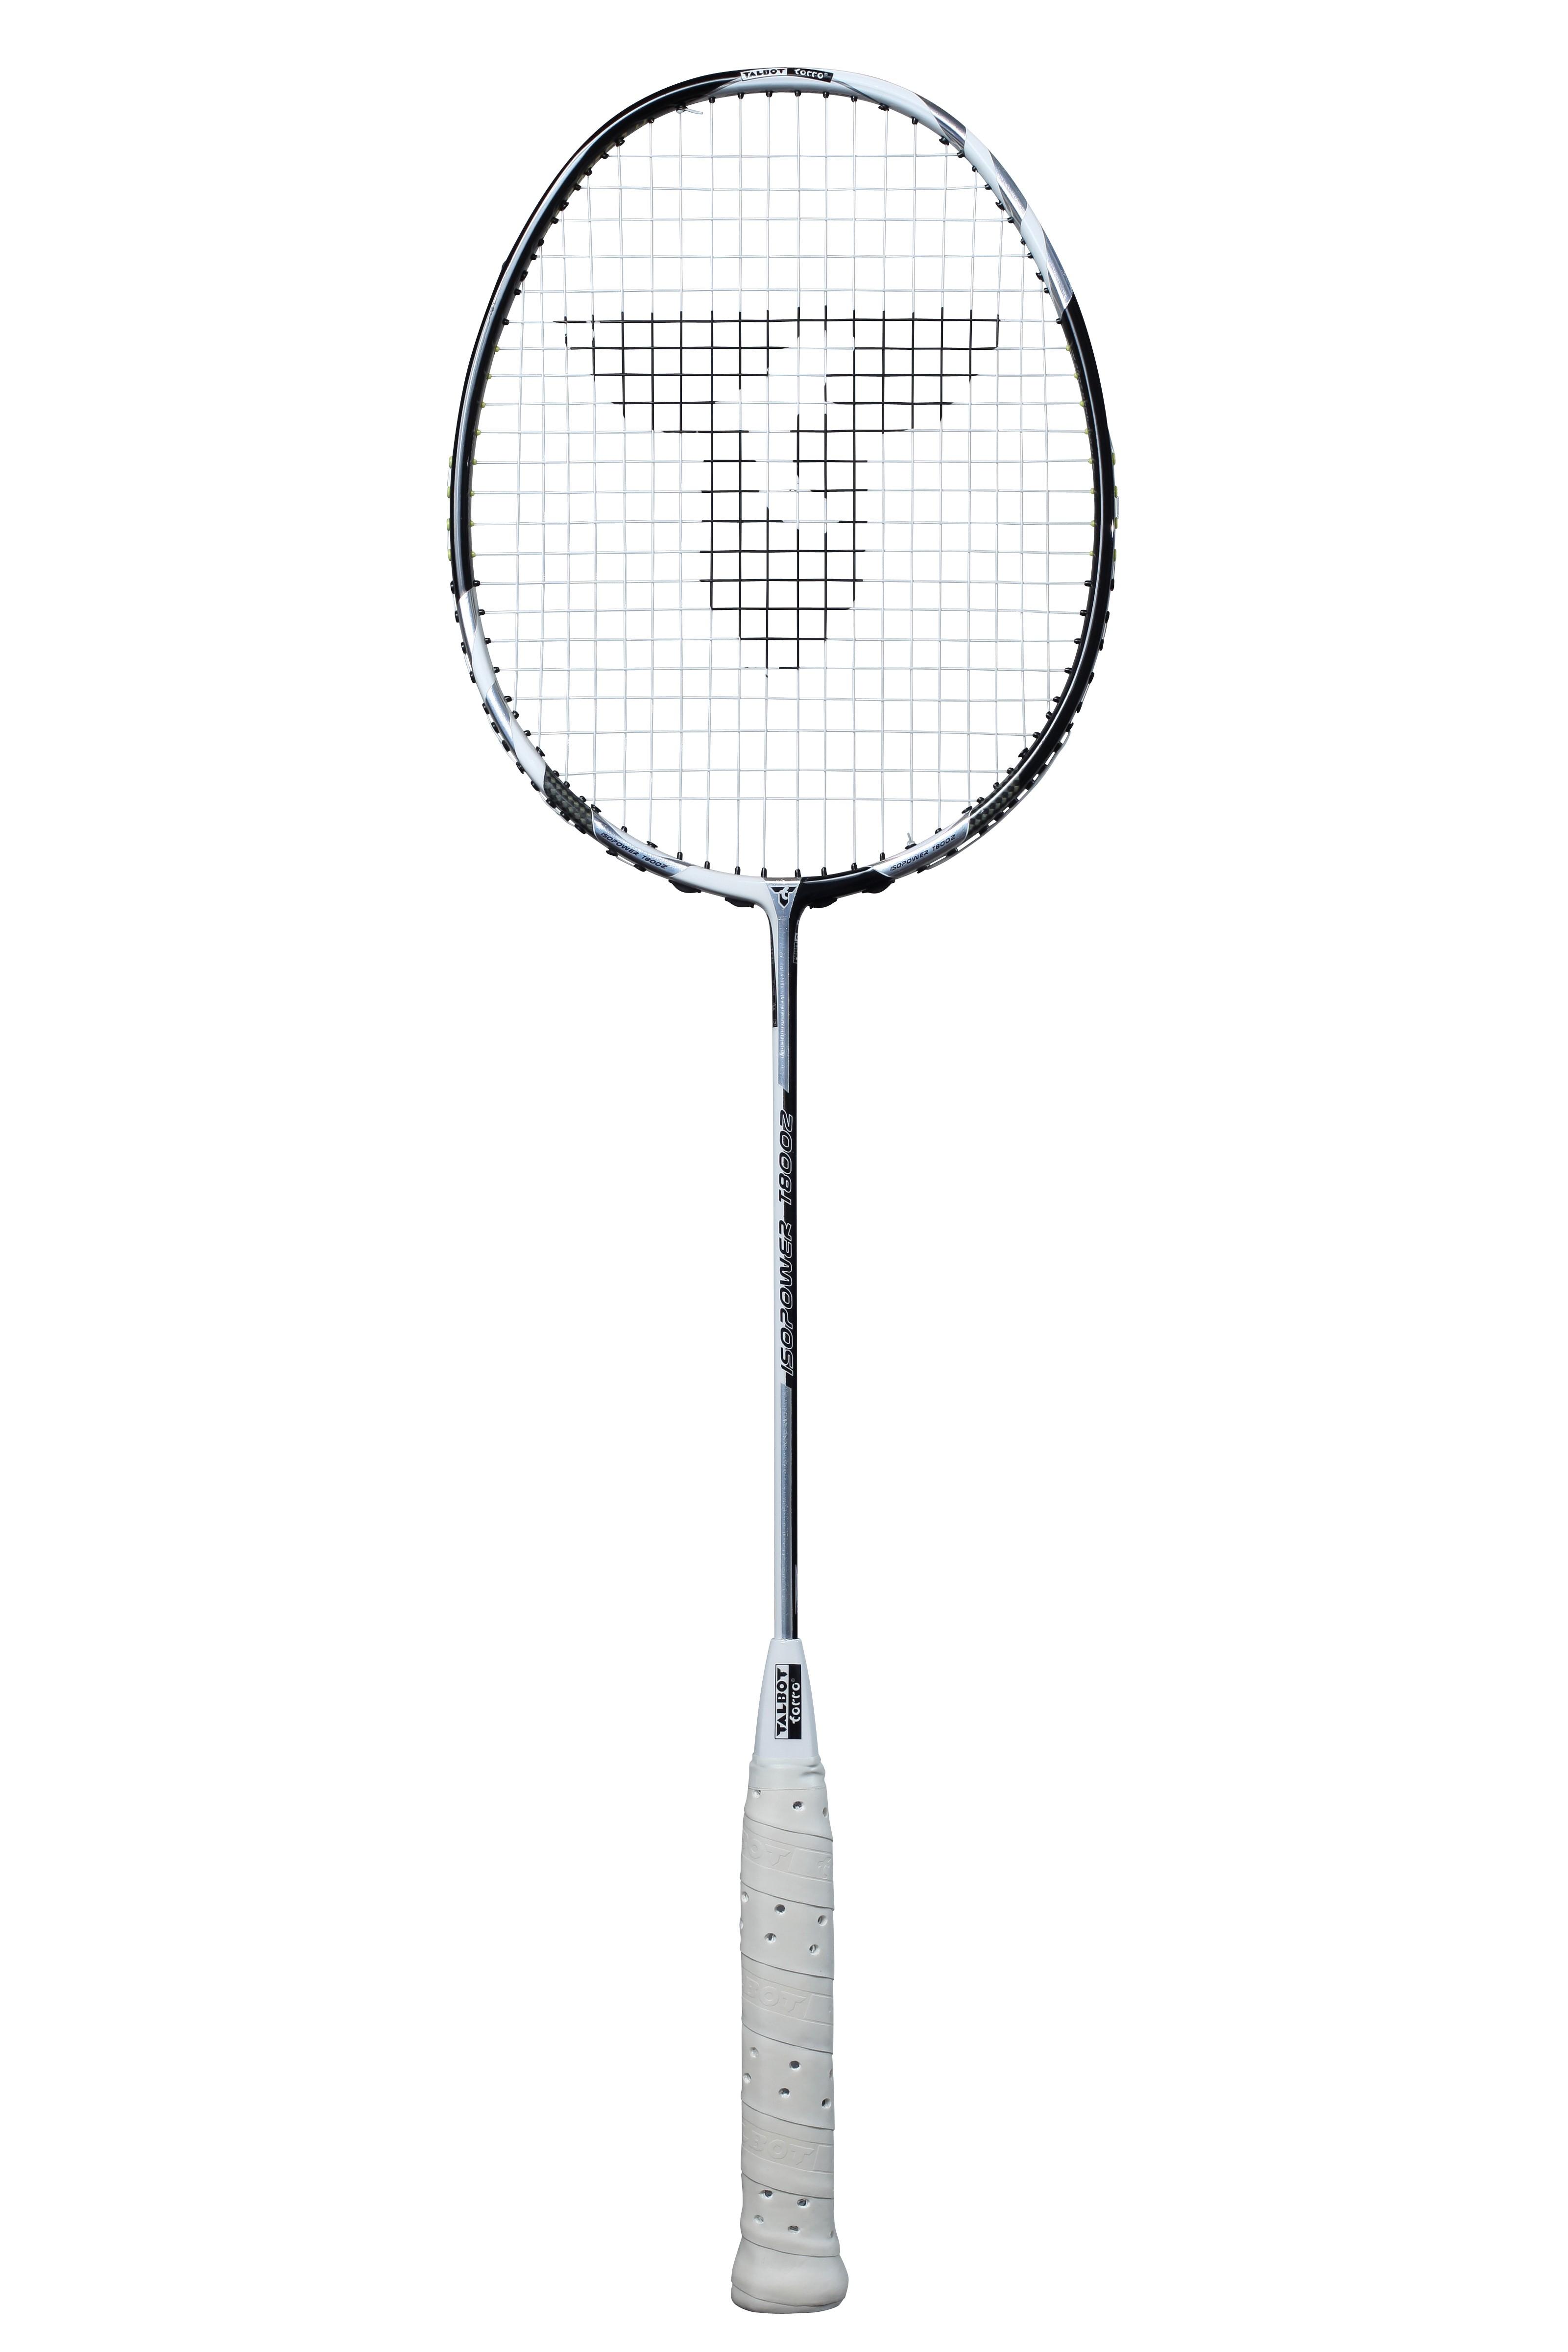 Racheta Badminton  Talbot Torro  Offensive  Isopower  87 G